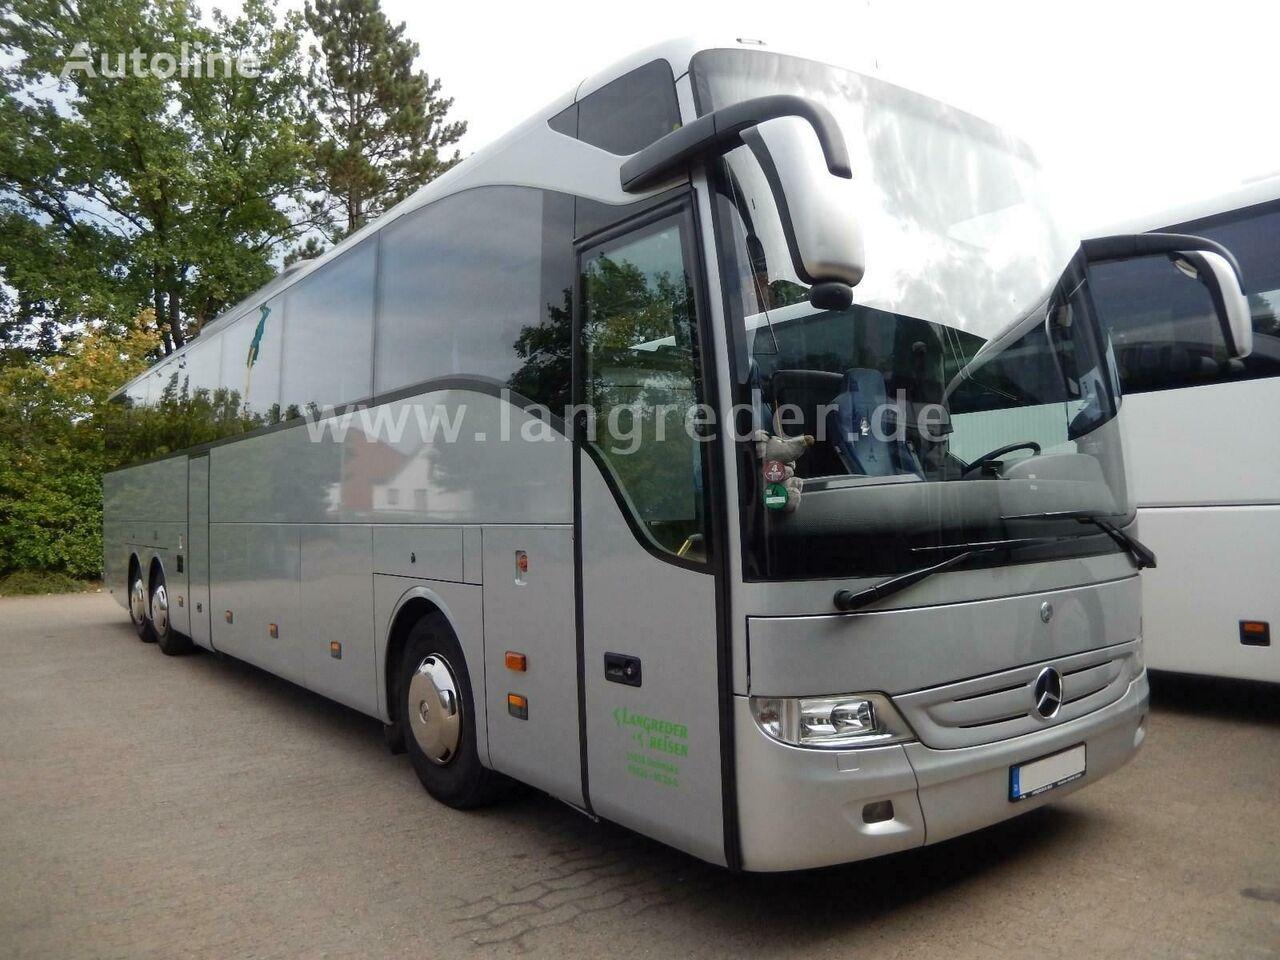 MERCEDES-BENZ Tourismo RHD-L coach bus